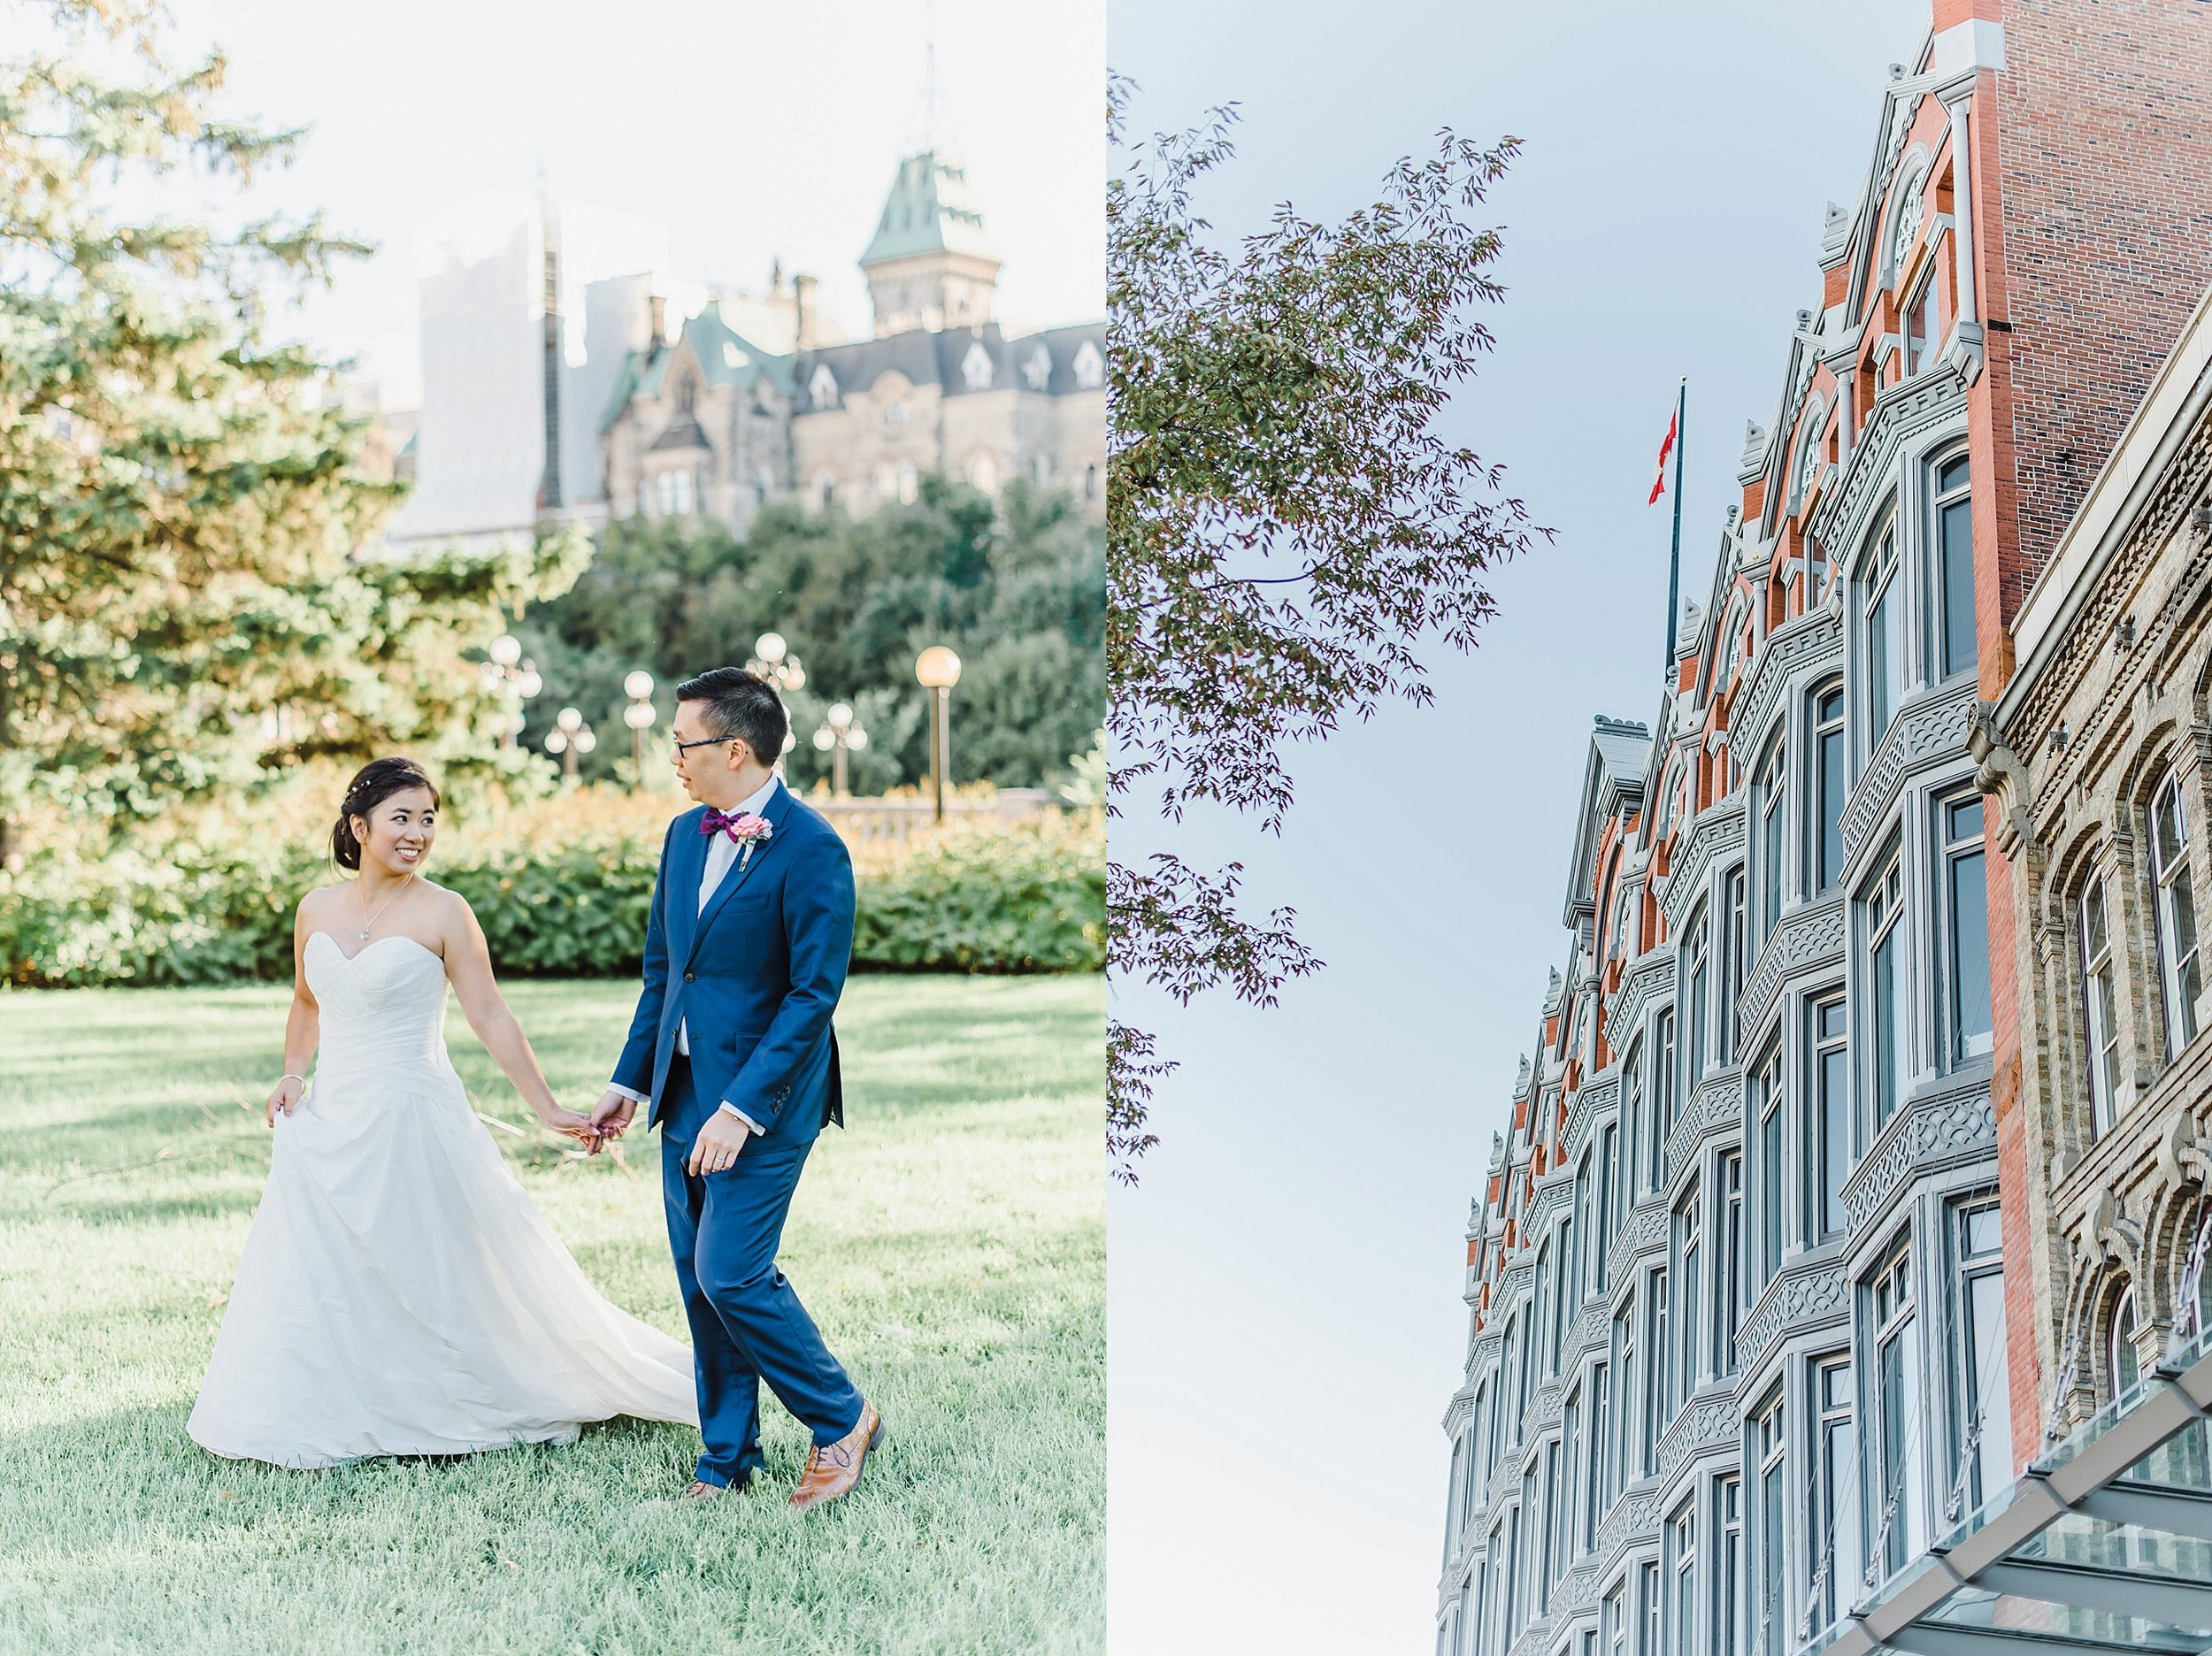 light airy indie fine art ottawa wedding photographer | Ali and Batoul Photography_1545.jpg